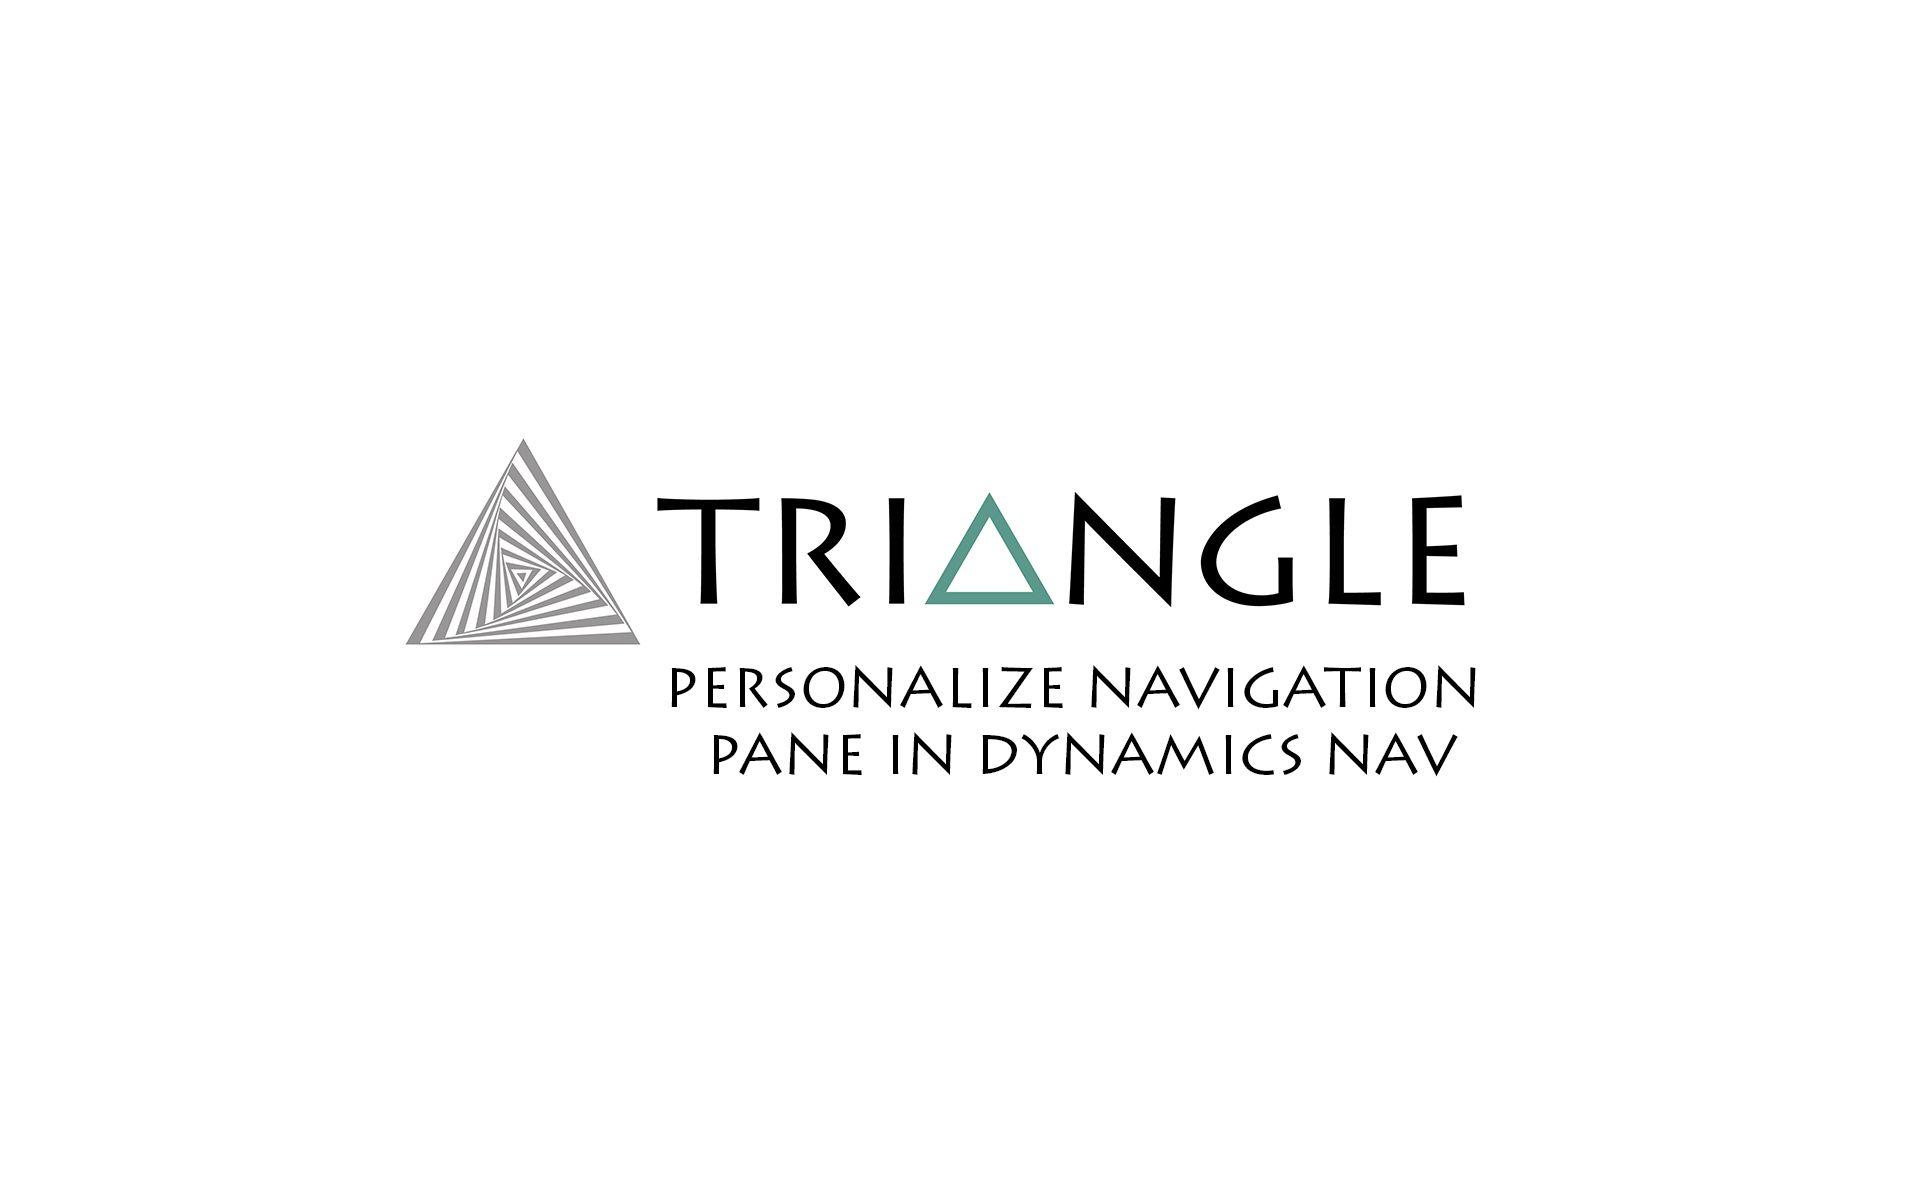 Personalize Navigation Pane Dynamics NAV